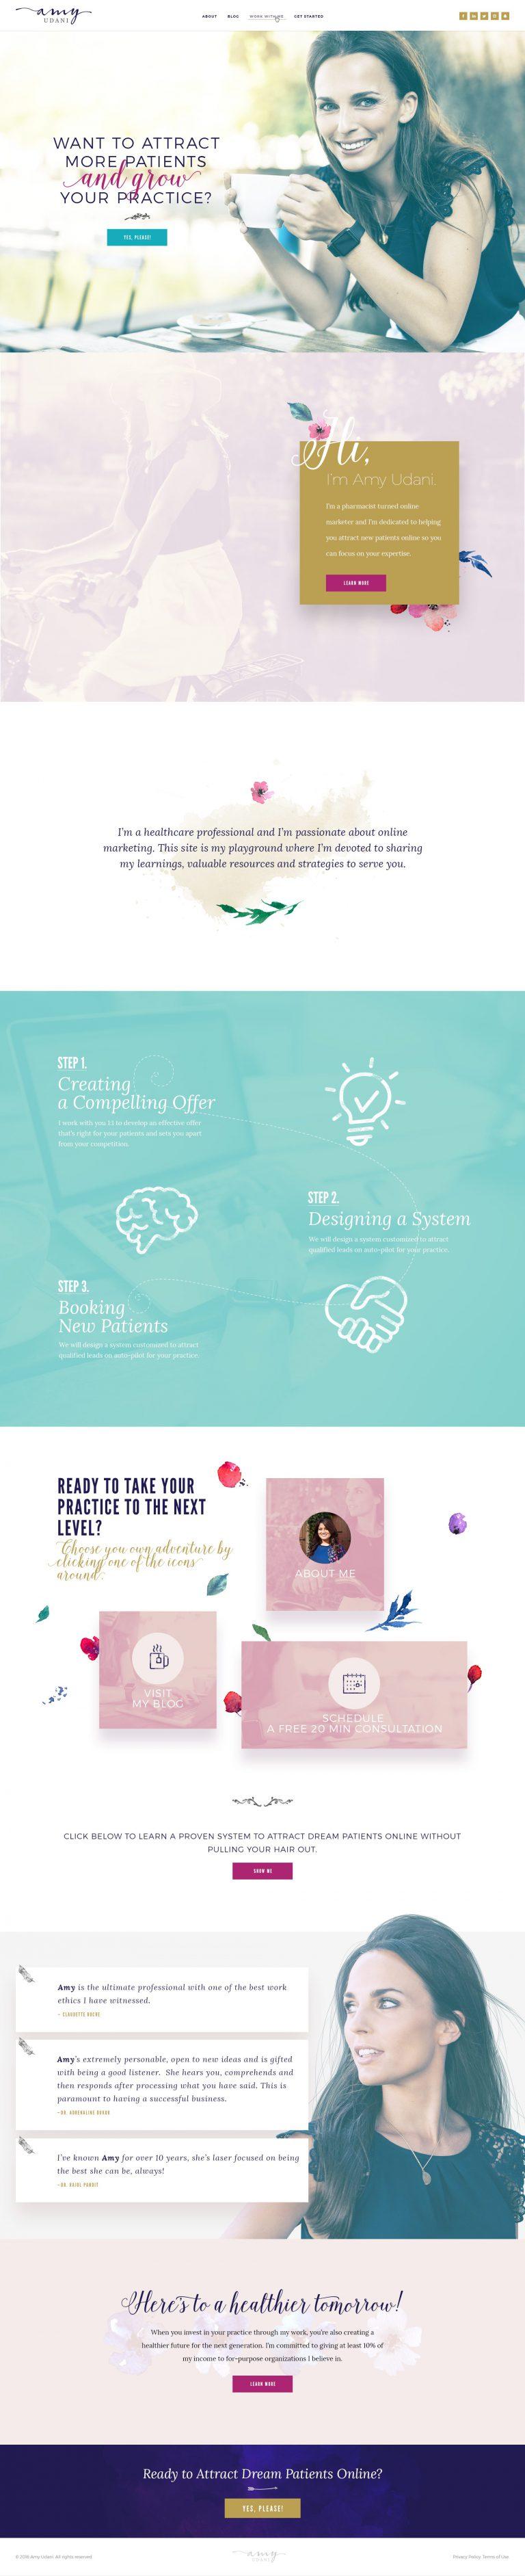 Version 1 of a website design for a female entrepreneur